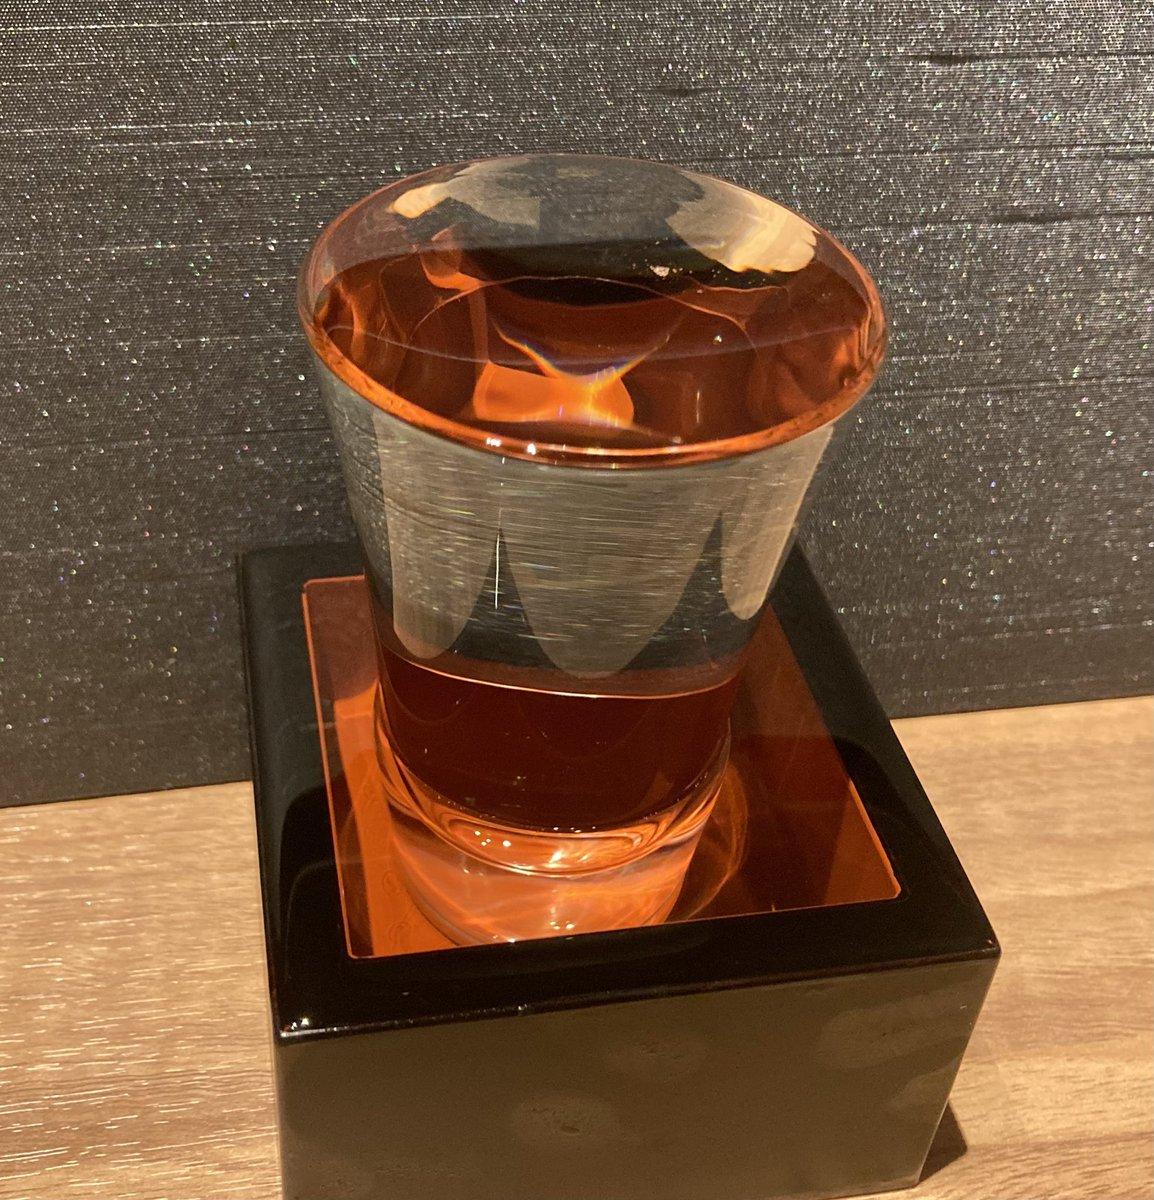 test ツイッターメディア - しめさばと日本酒。二世古 彗星 https://t.co/9pUV5OJ7lI